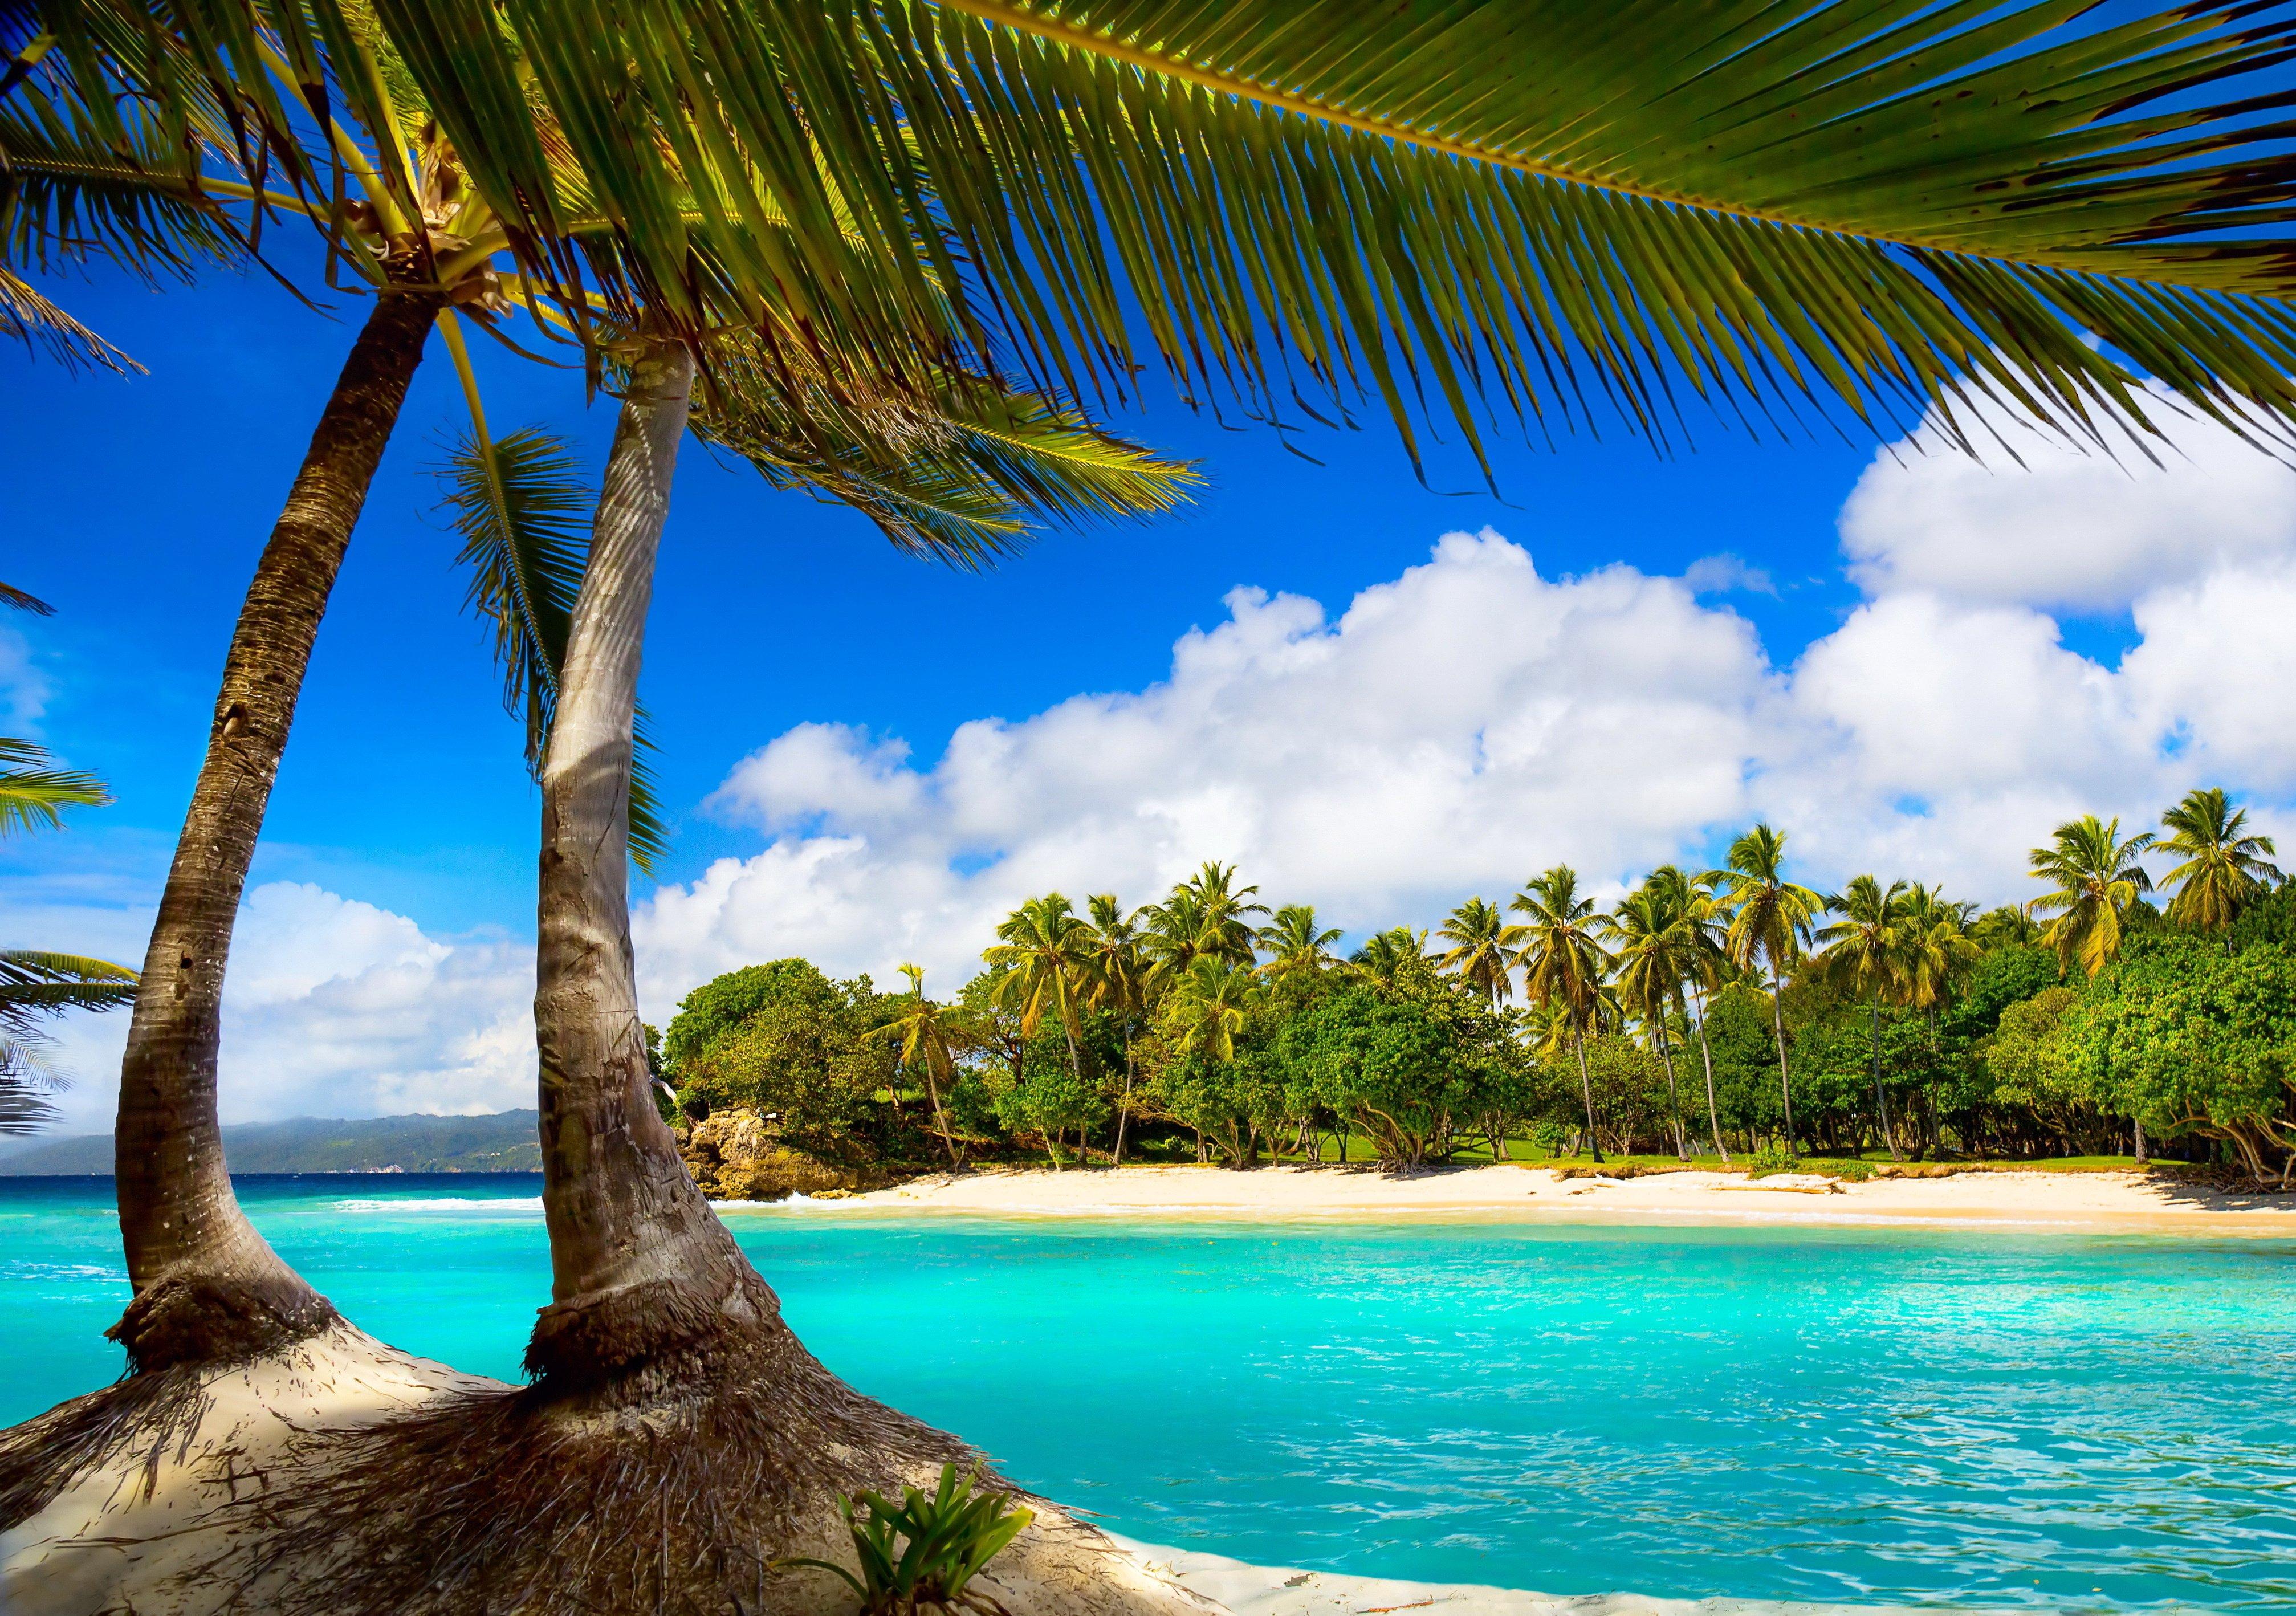 Vacation beach summer tropical sea palms paradise ocean 4028x2835